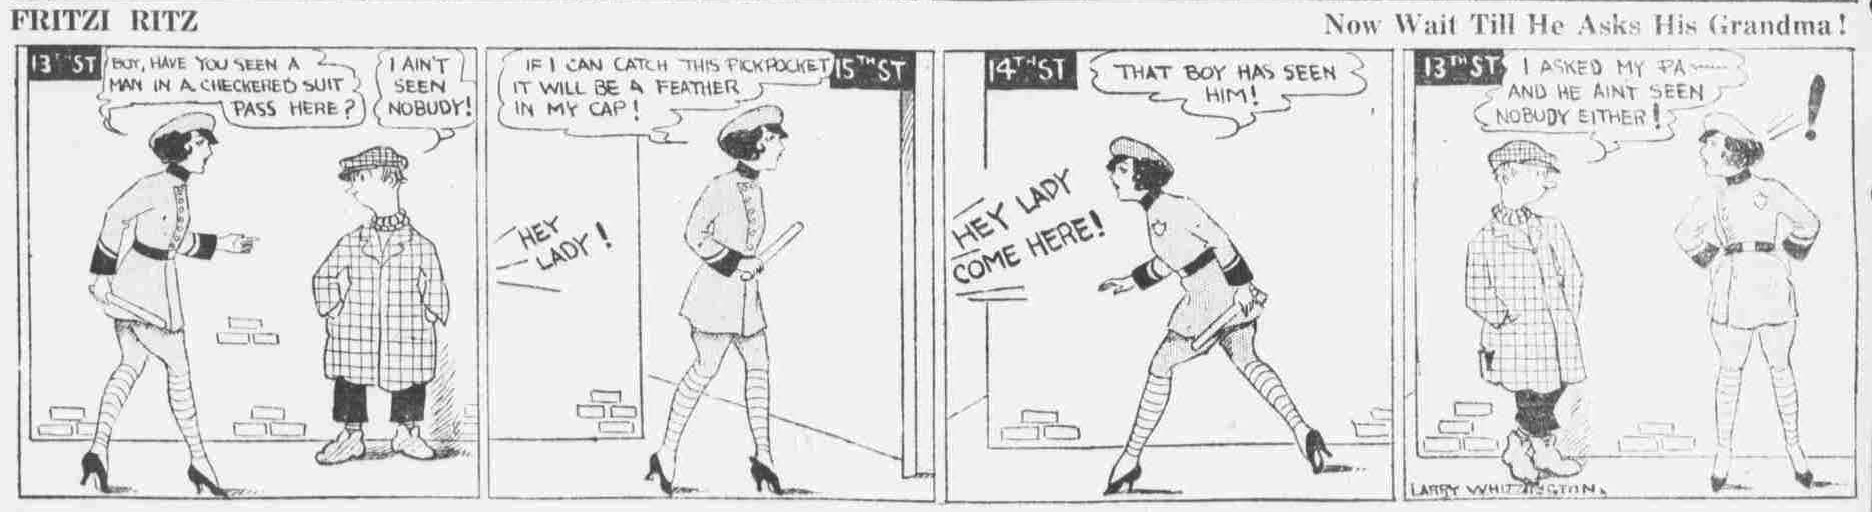 Nov. 13, 1922